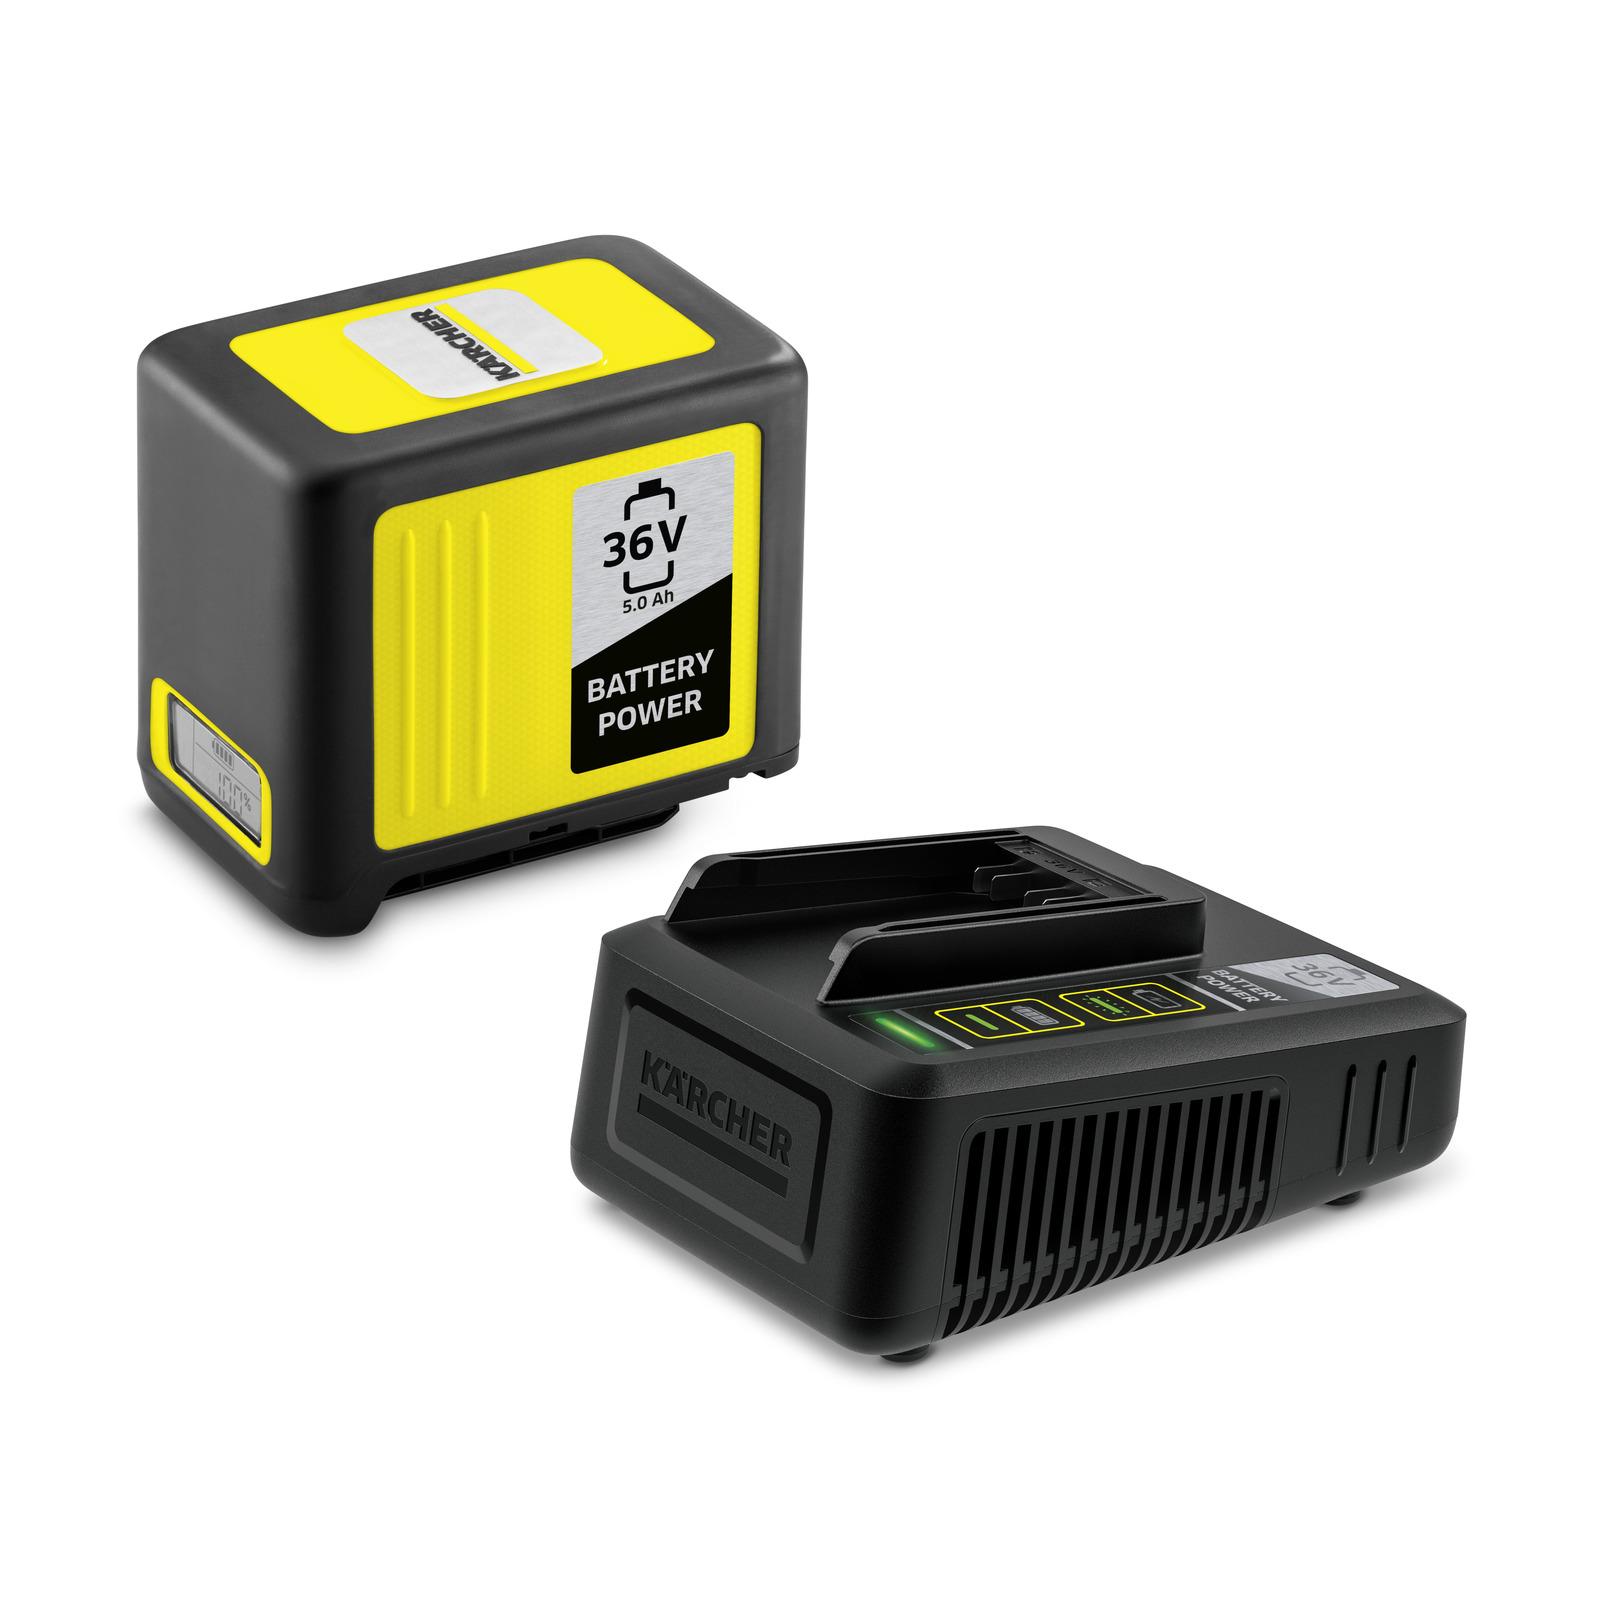 Комплект стартовый Karcher starter kit battery аккумулятор зарядное устройство karcher starter kit battery power 36 25 2 445 064